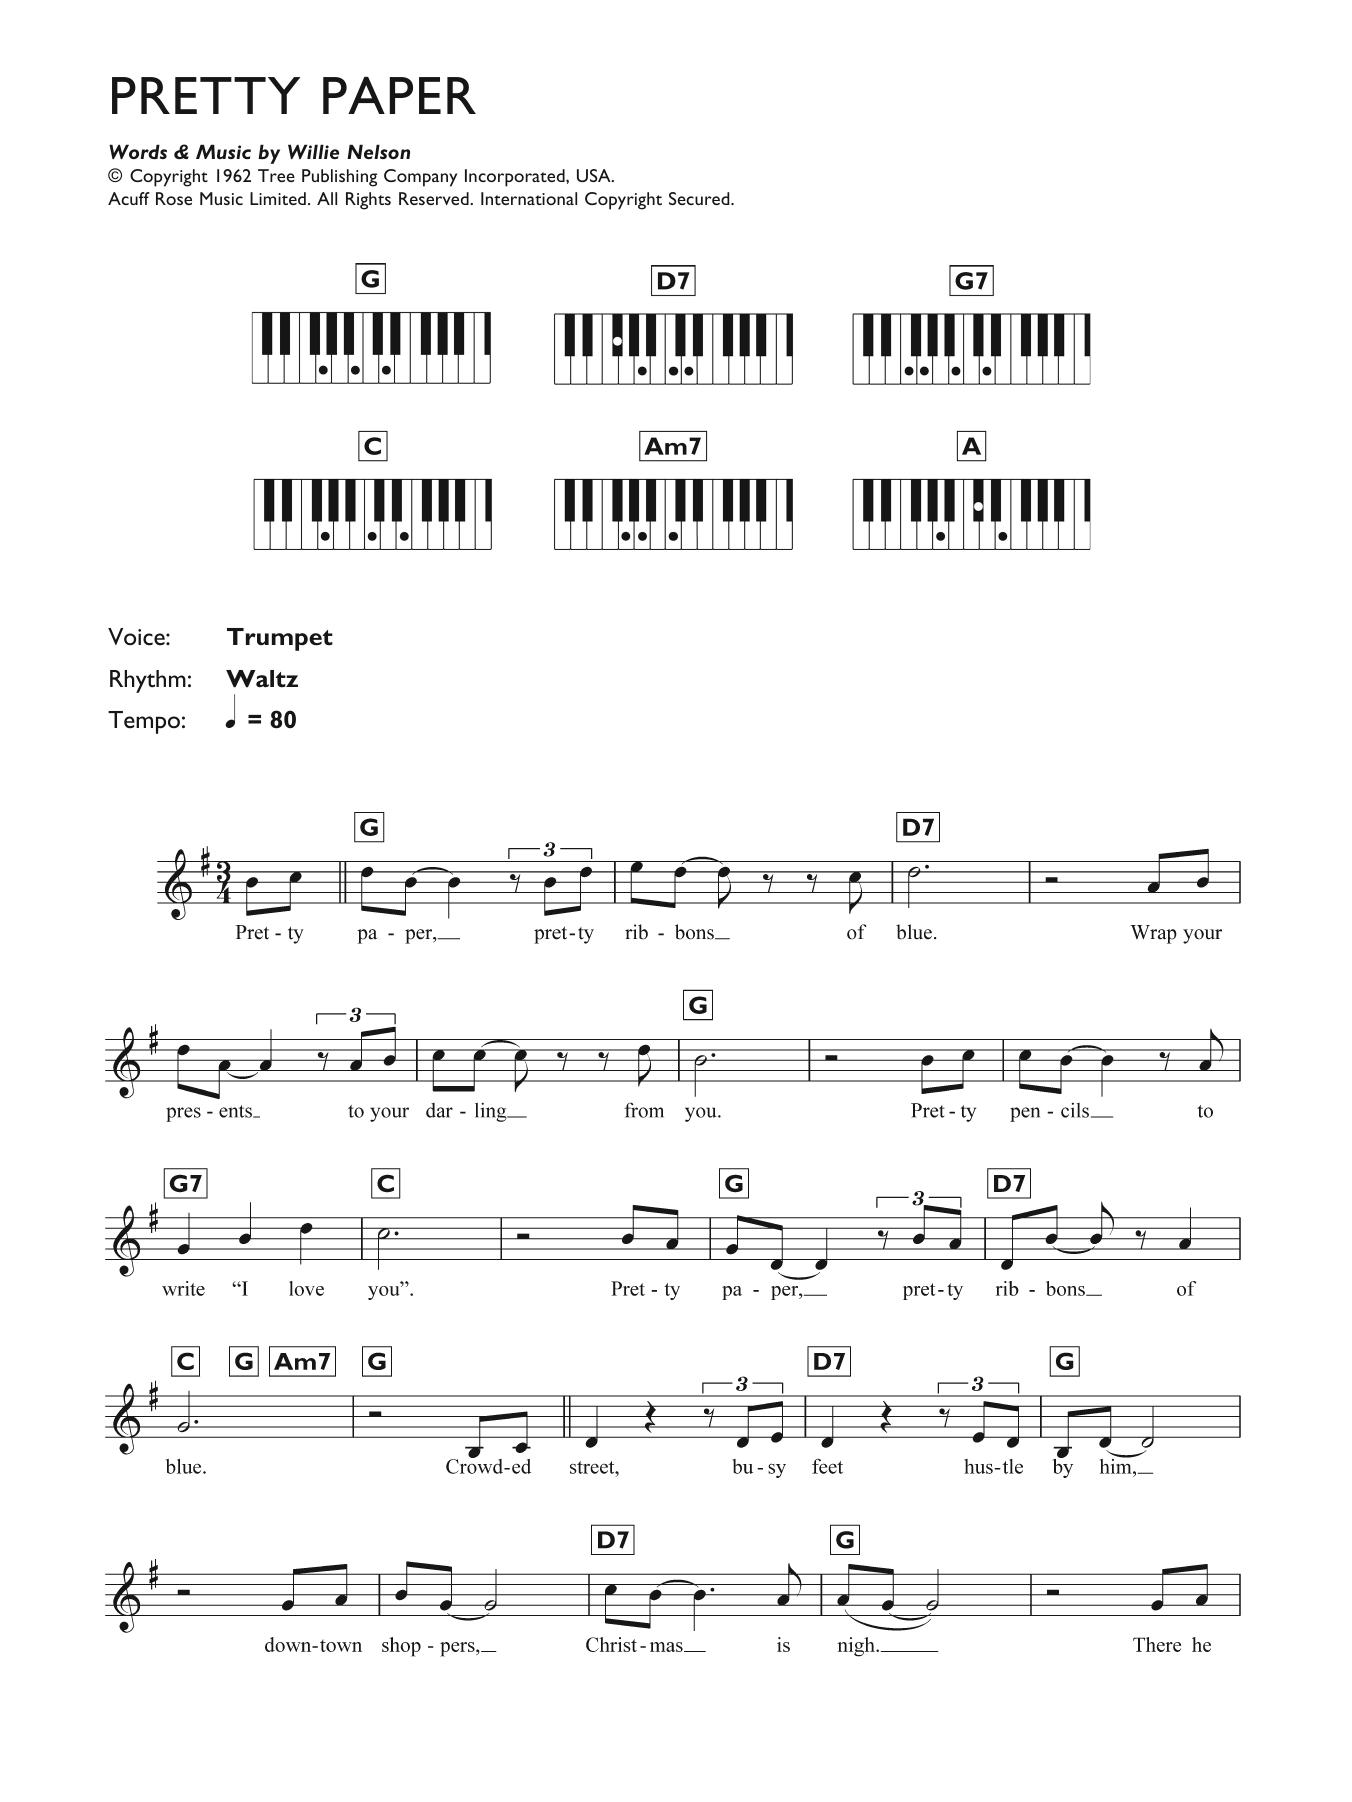 Pretty Paper Sheet Music